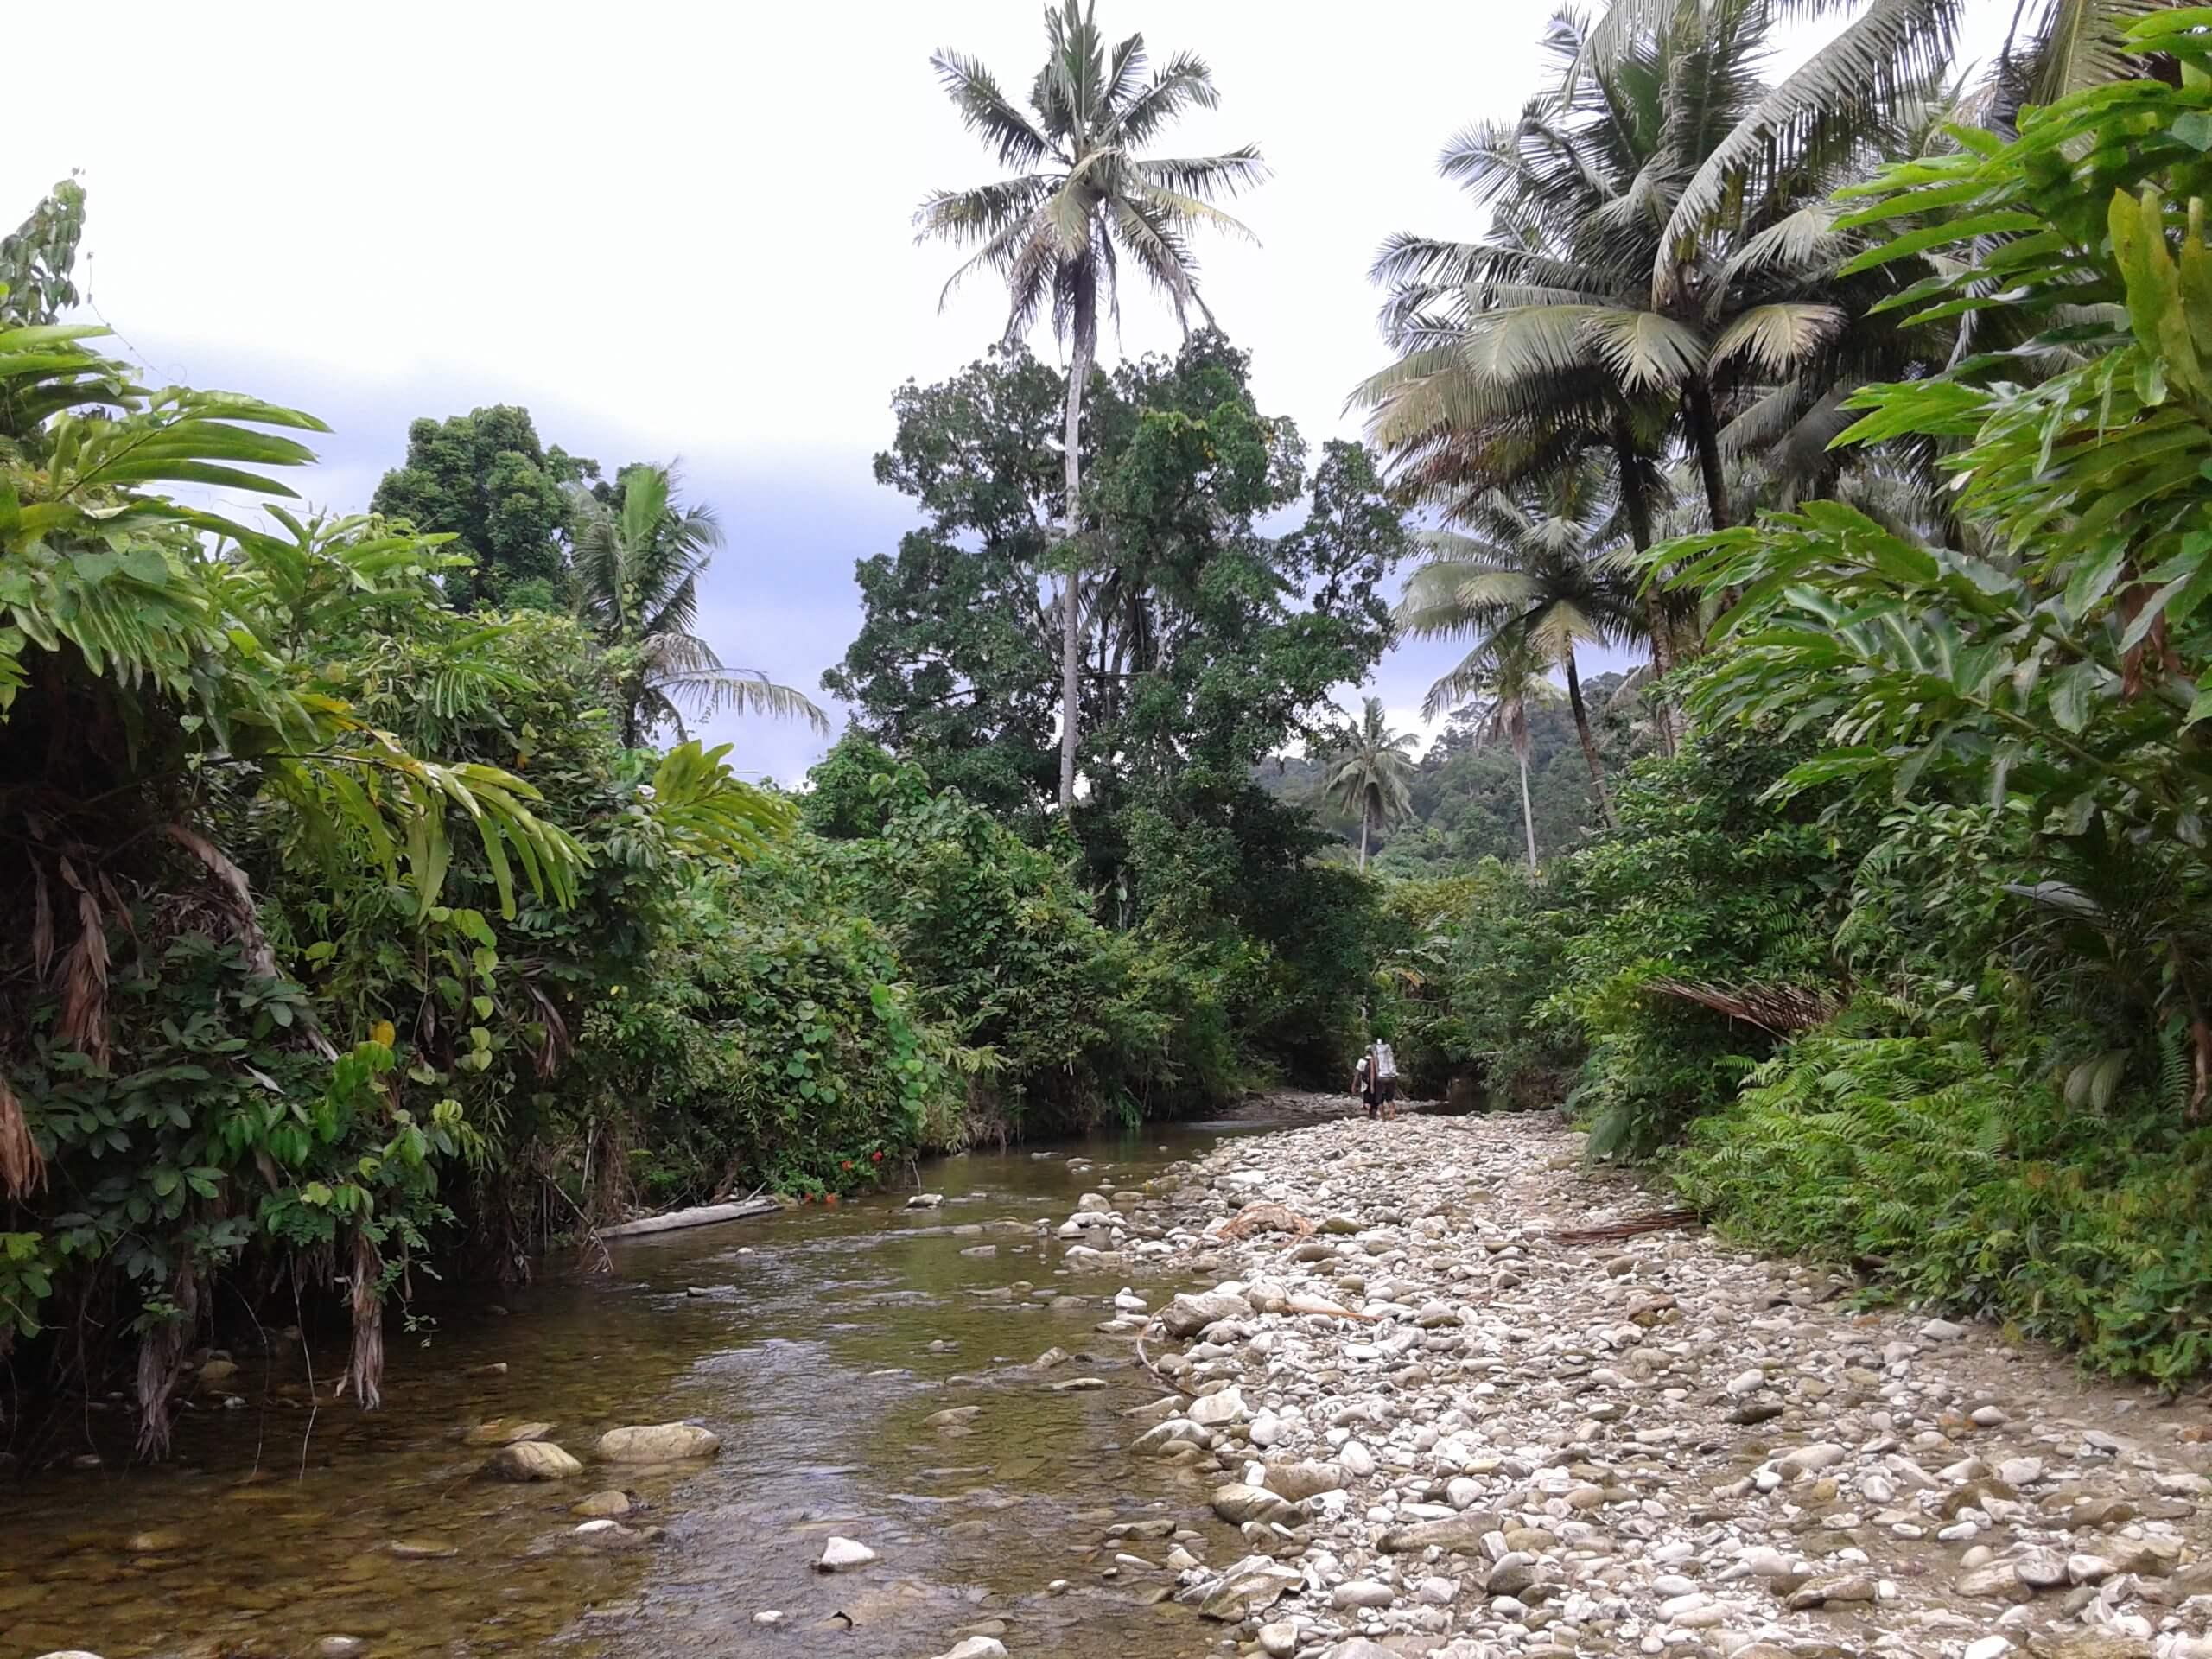 Rivière au milieu de la jungle à Sumatra Siberut Mentawai